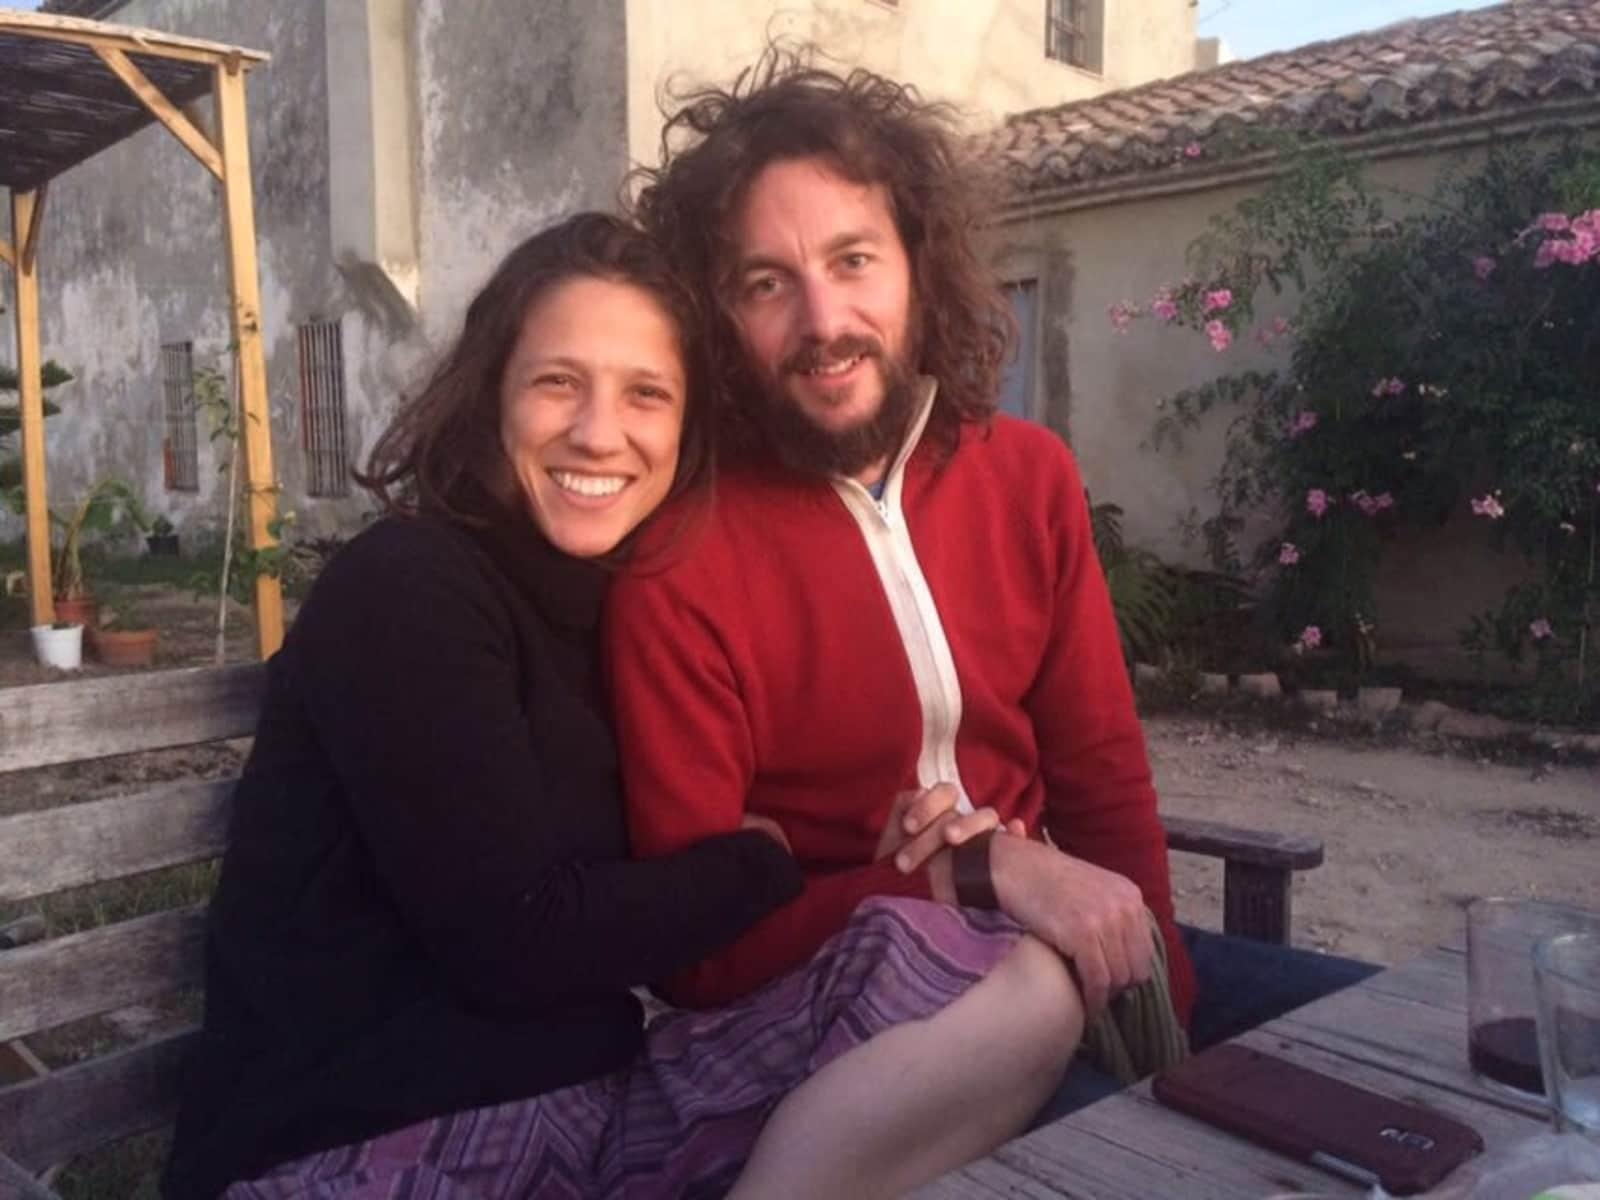 Monique & Lars from Valencia, Spain